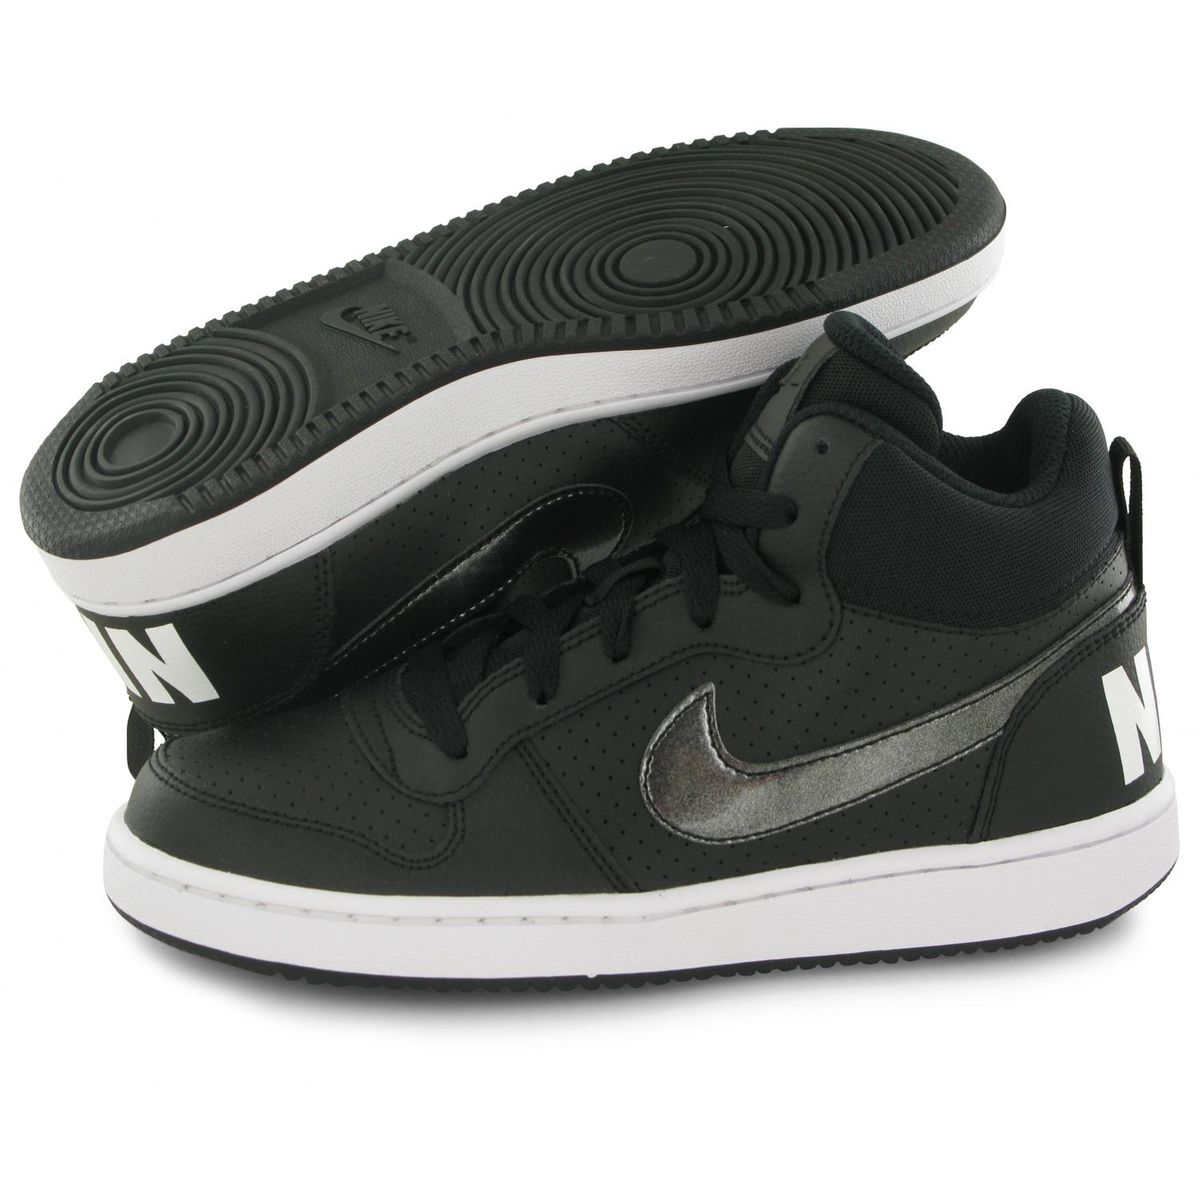 chaussure nike enfant fille 37